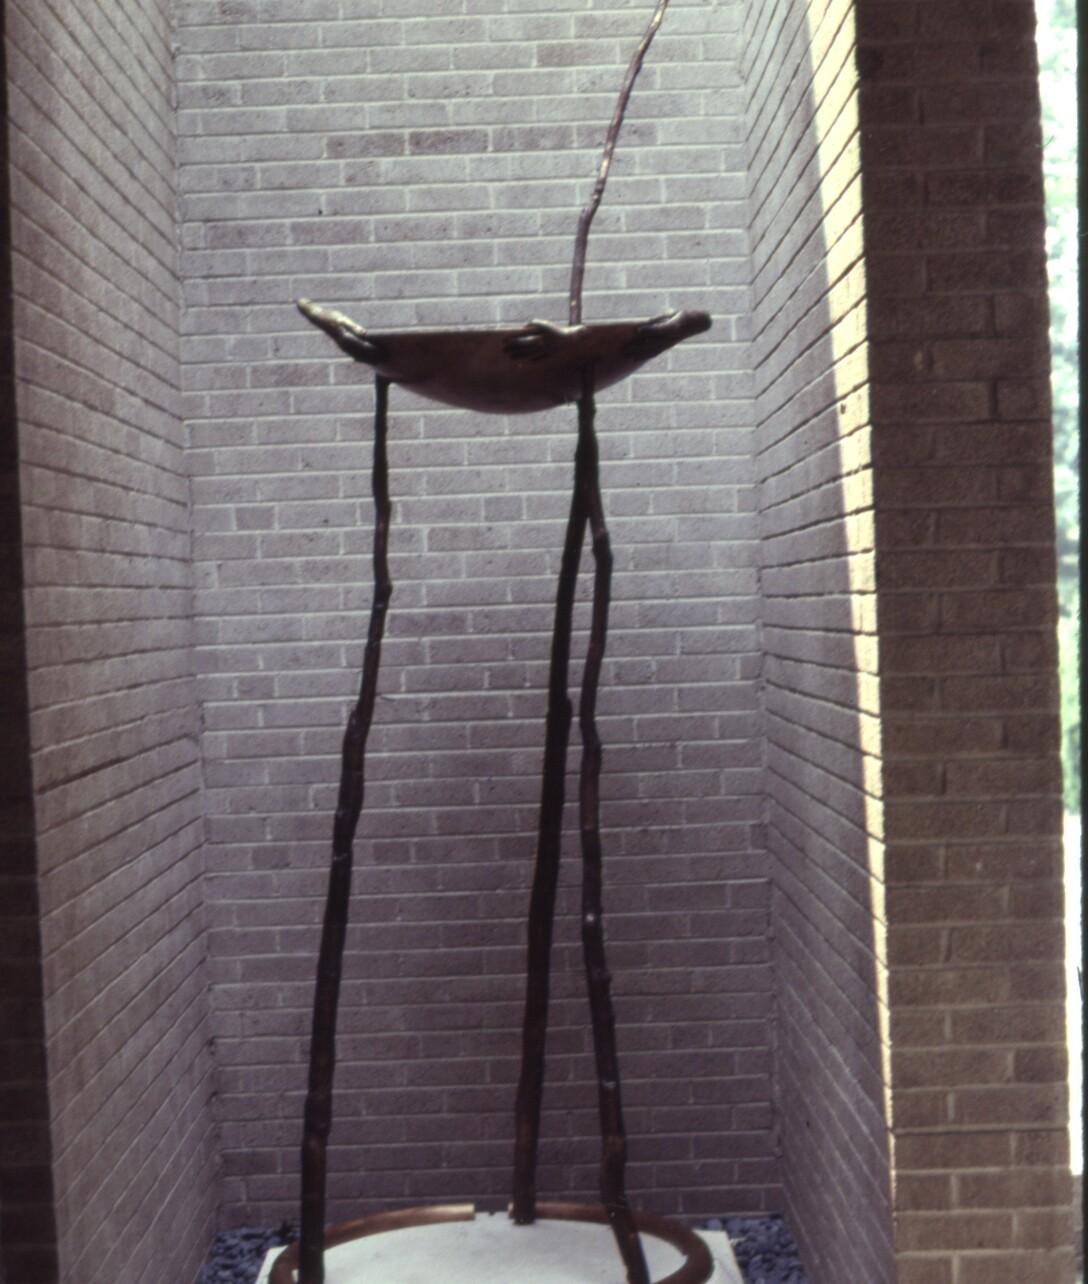 Commission, St. John's, cast bronze, stone